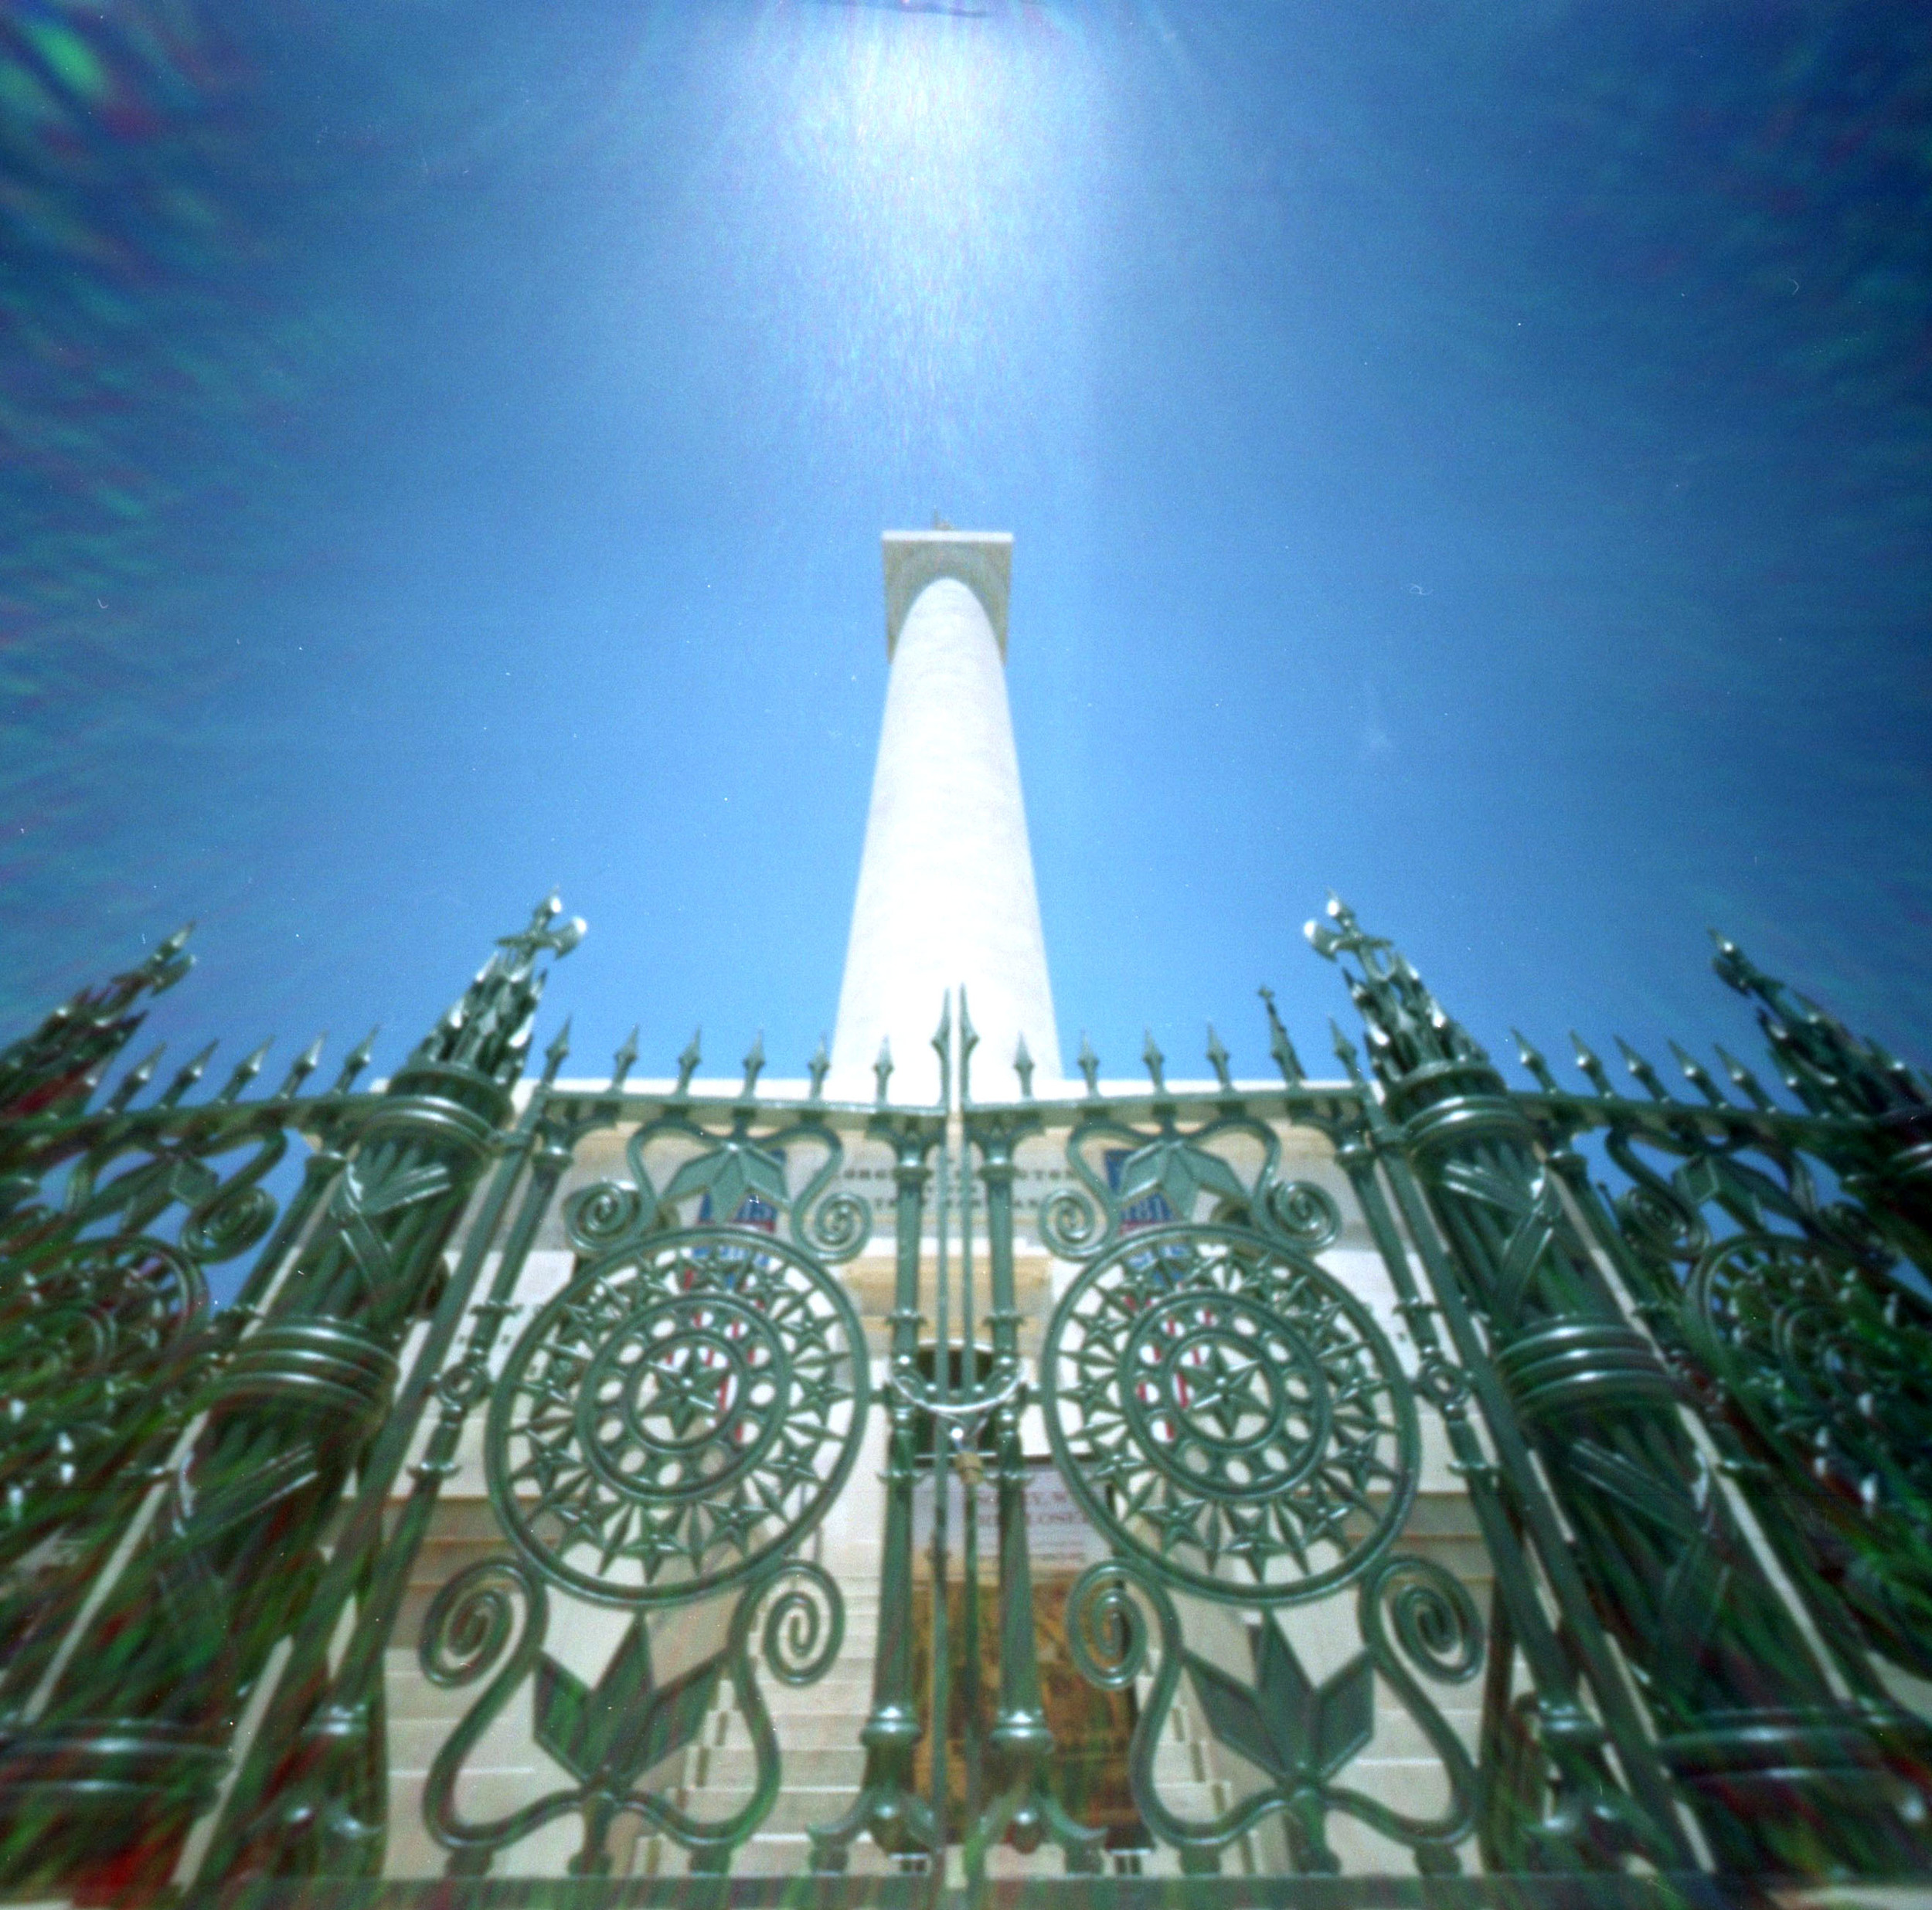 monument_behind_gate.jpg